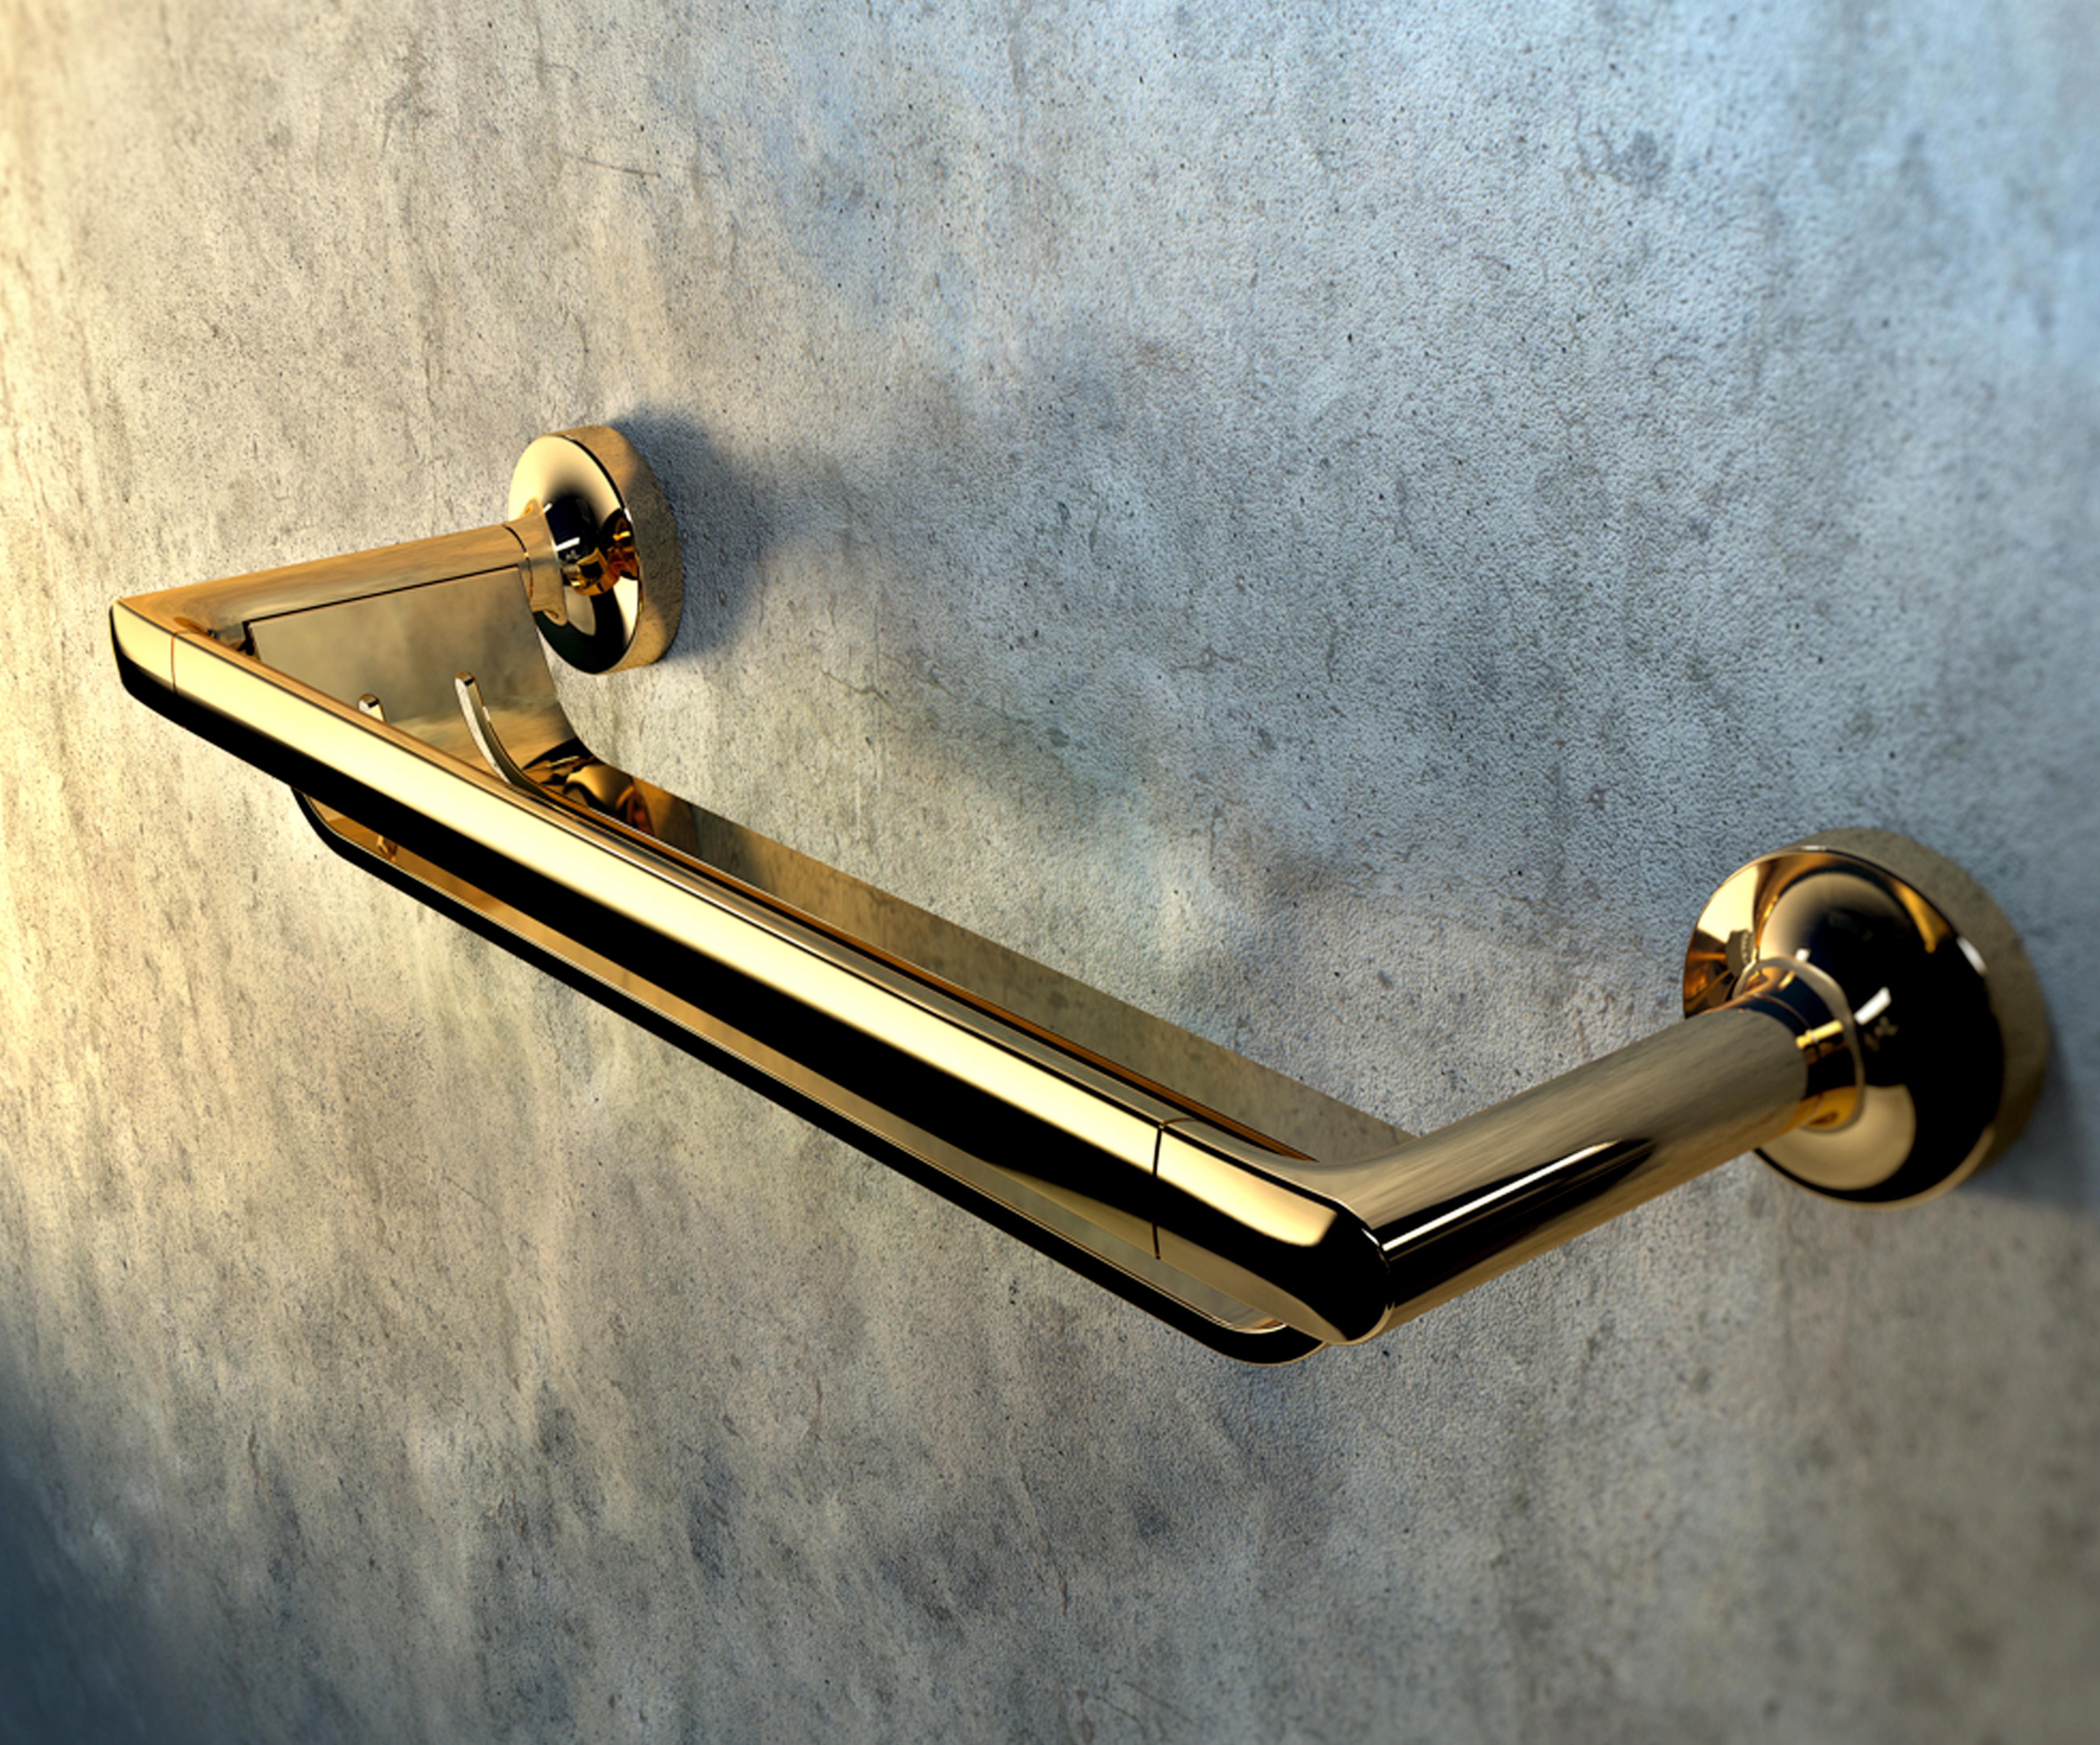 Geesa bathroom accessories - Geesa_gold Tone Thumb